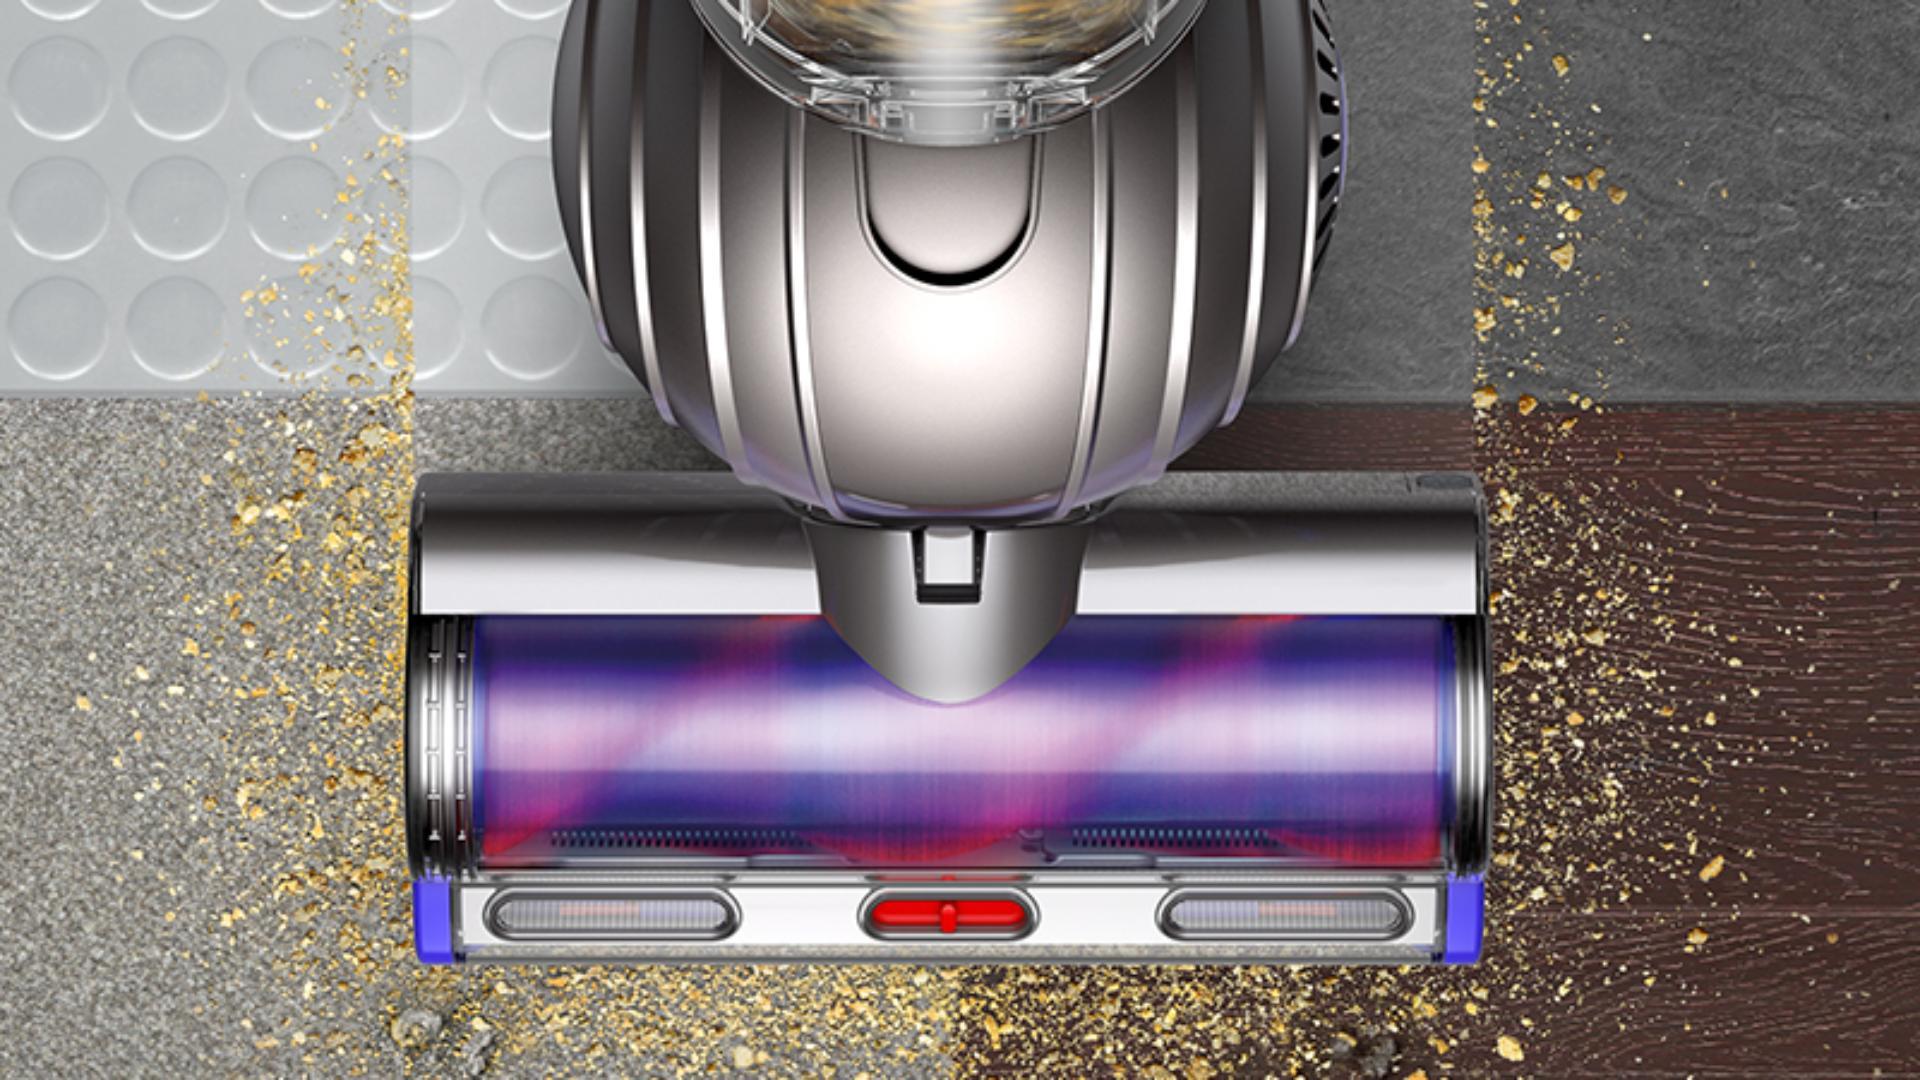 A Direct-drive motor